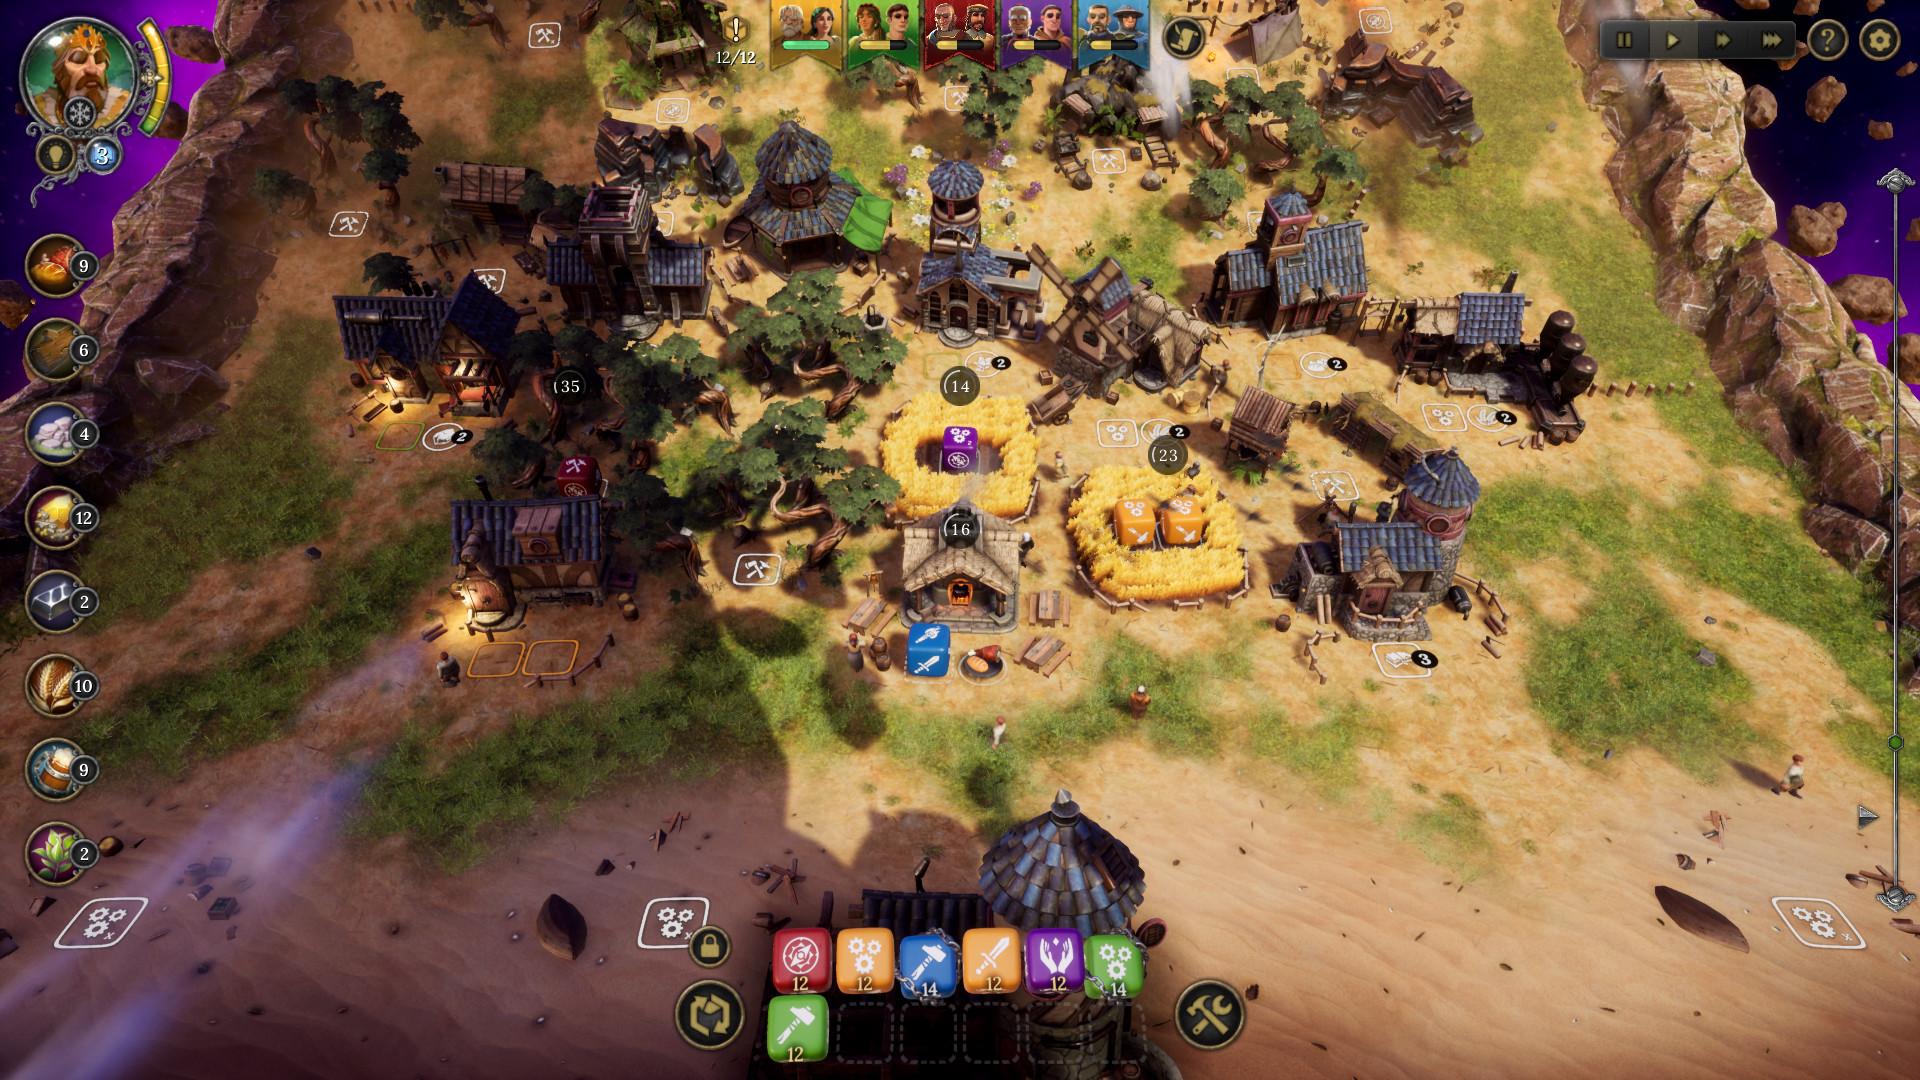 dice-legacy-deluxe-pc-screenshot-4